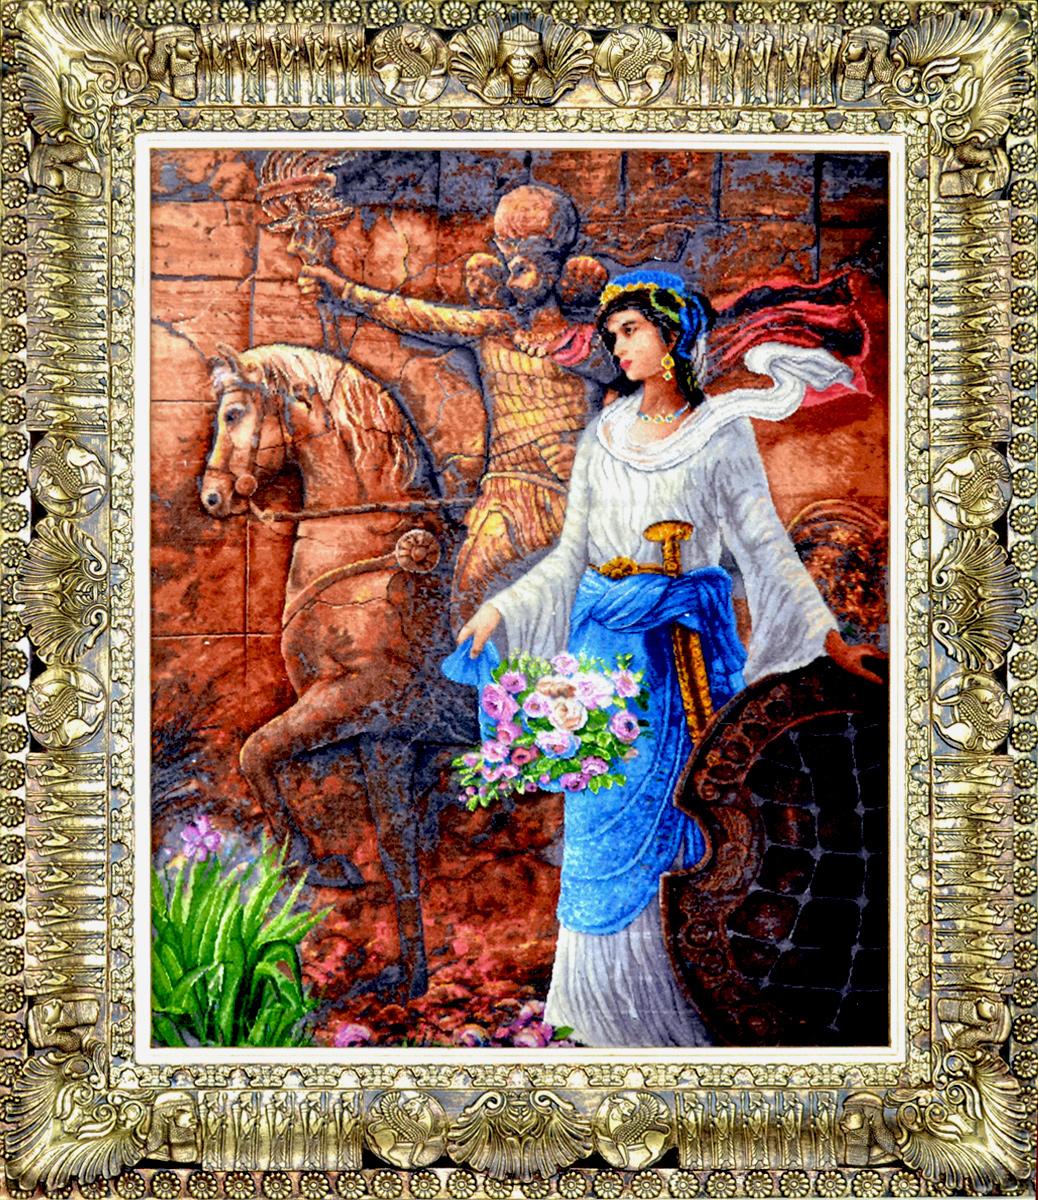 Aryates-Persian-Silk-Hand-Woven-Tableau-Rug-1233-wool-105x90